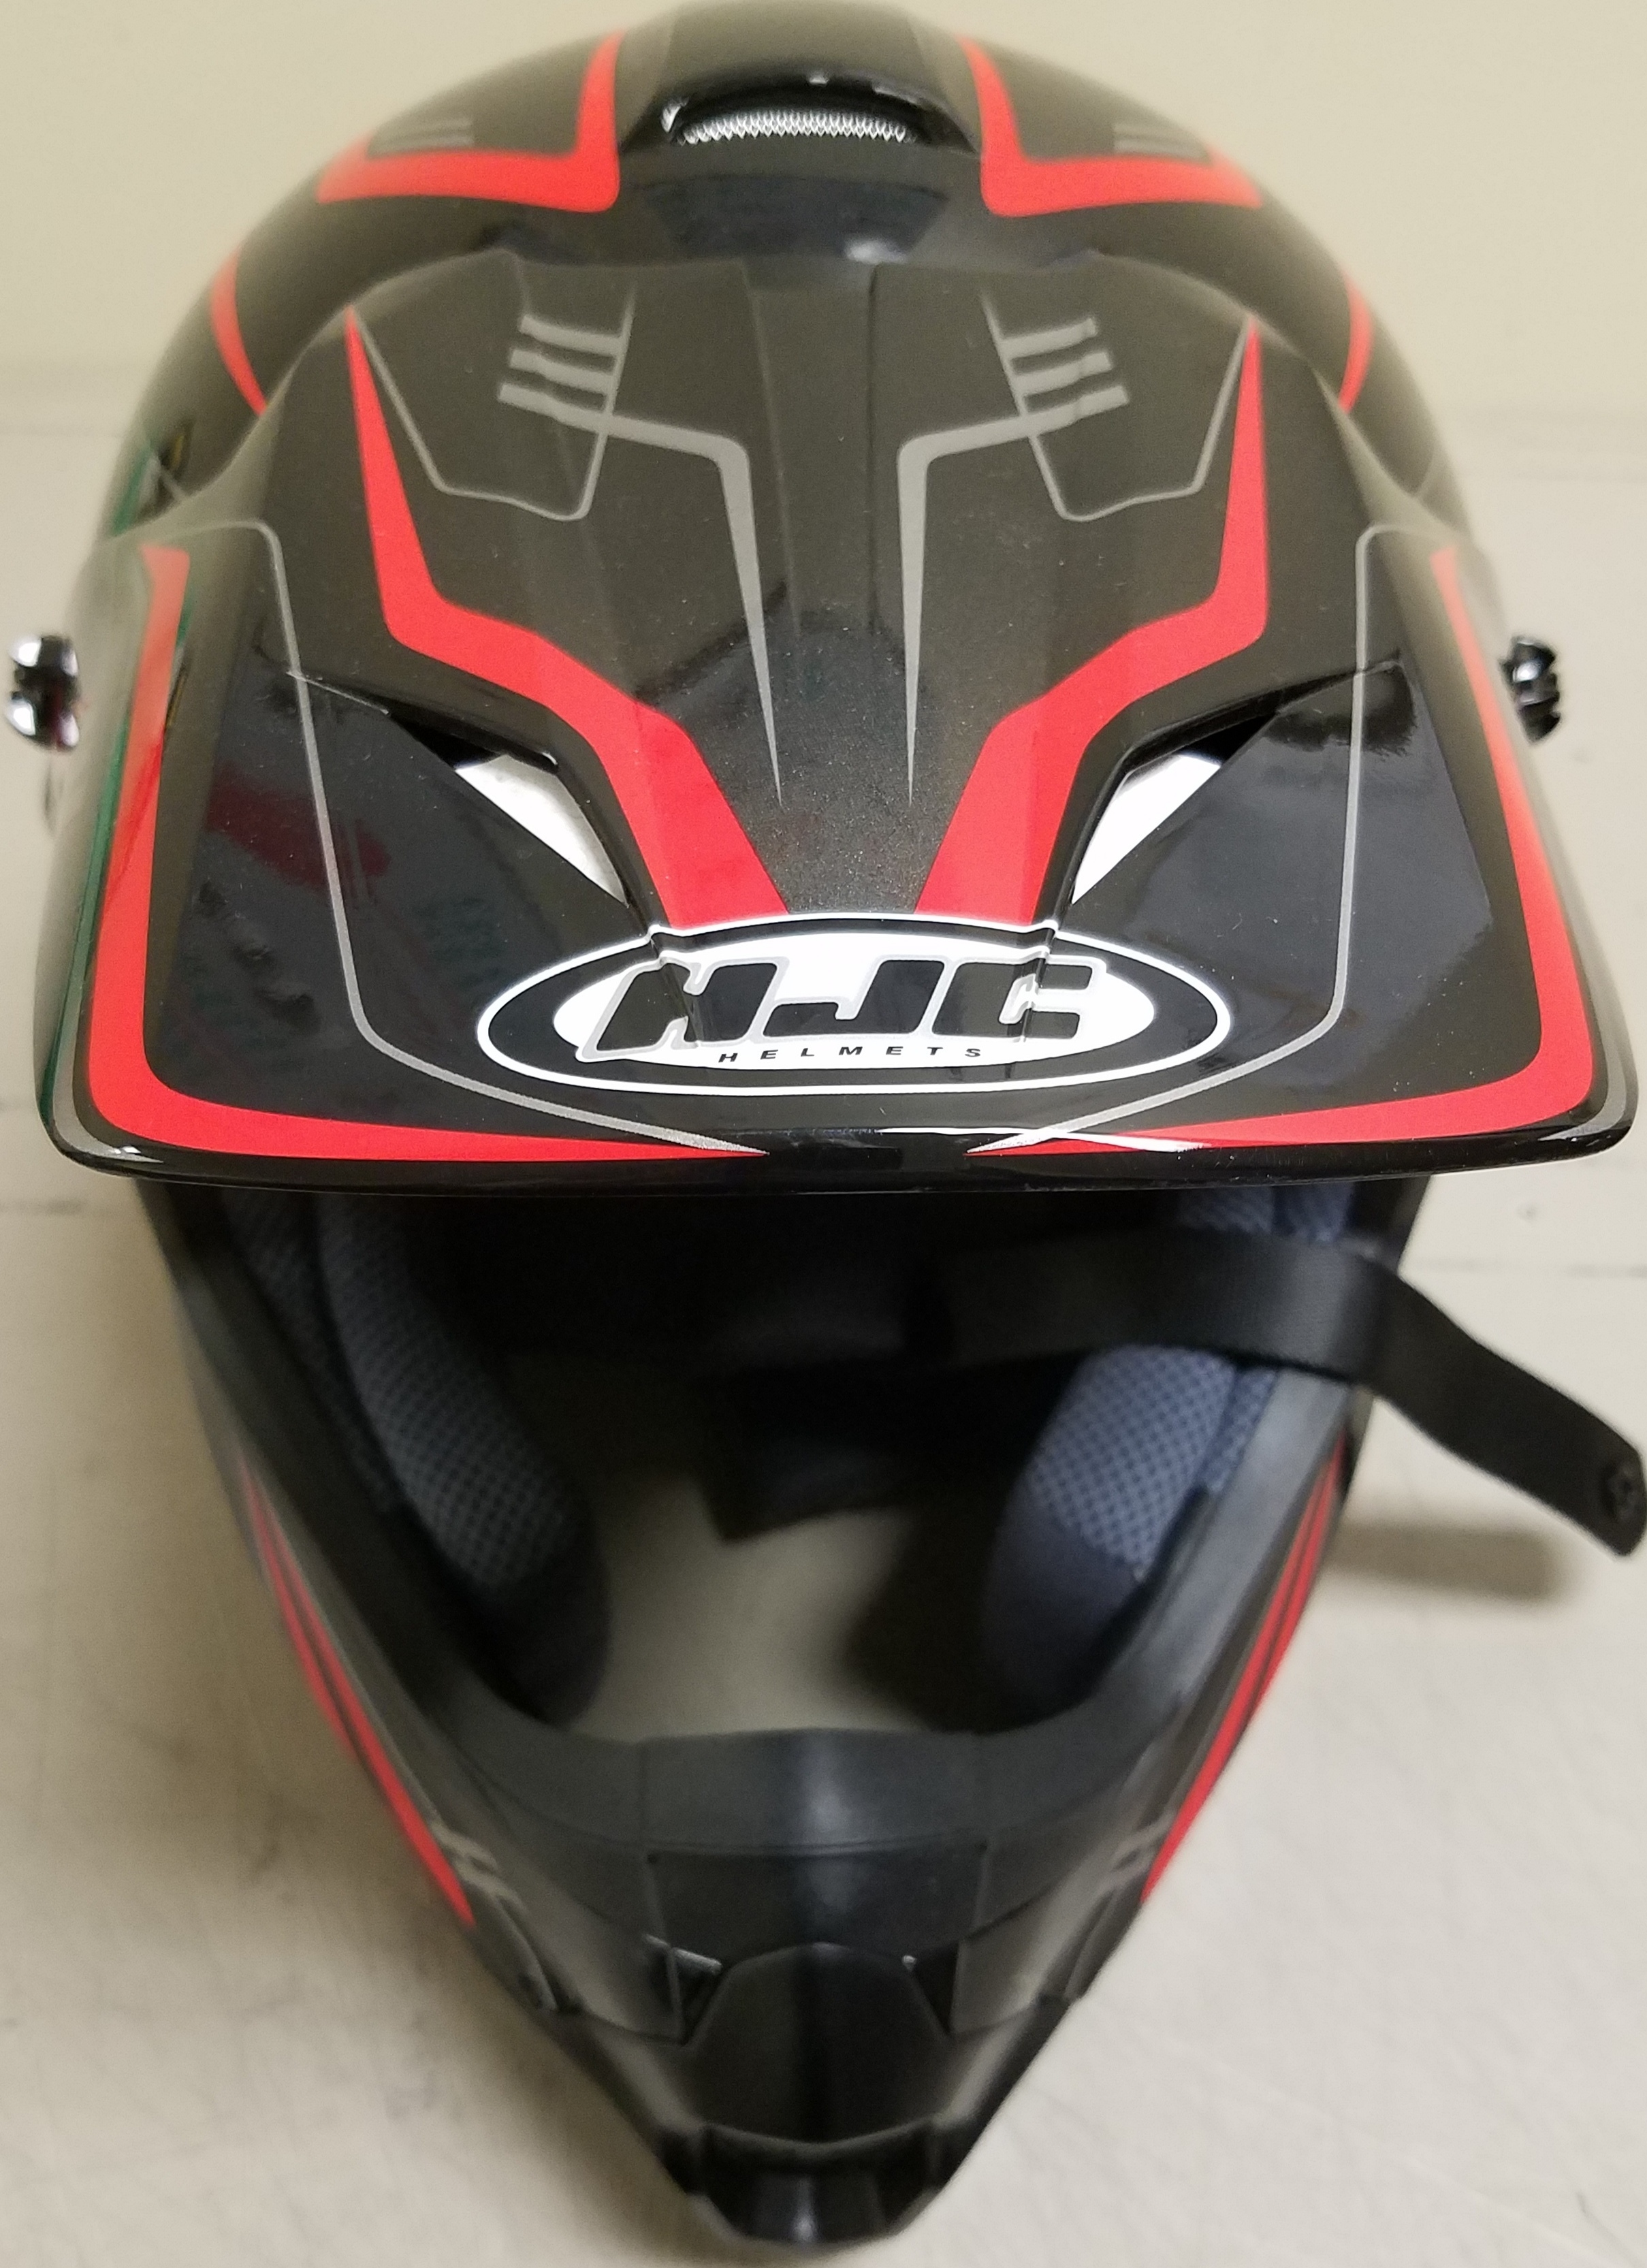 HJC - CS-MX II - OFF ROAD SIZE L HELMET